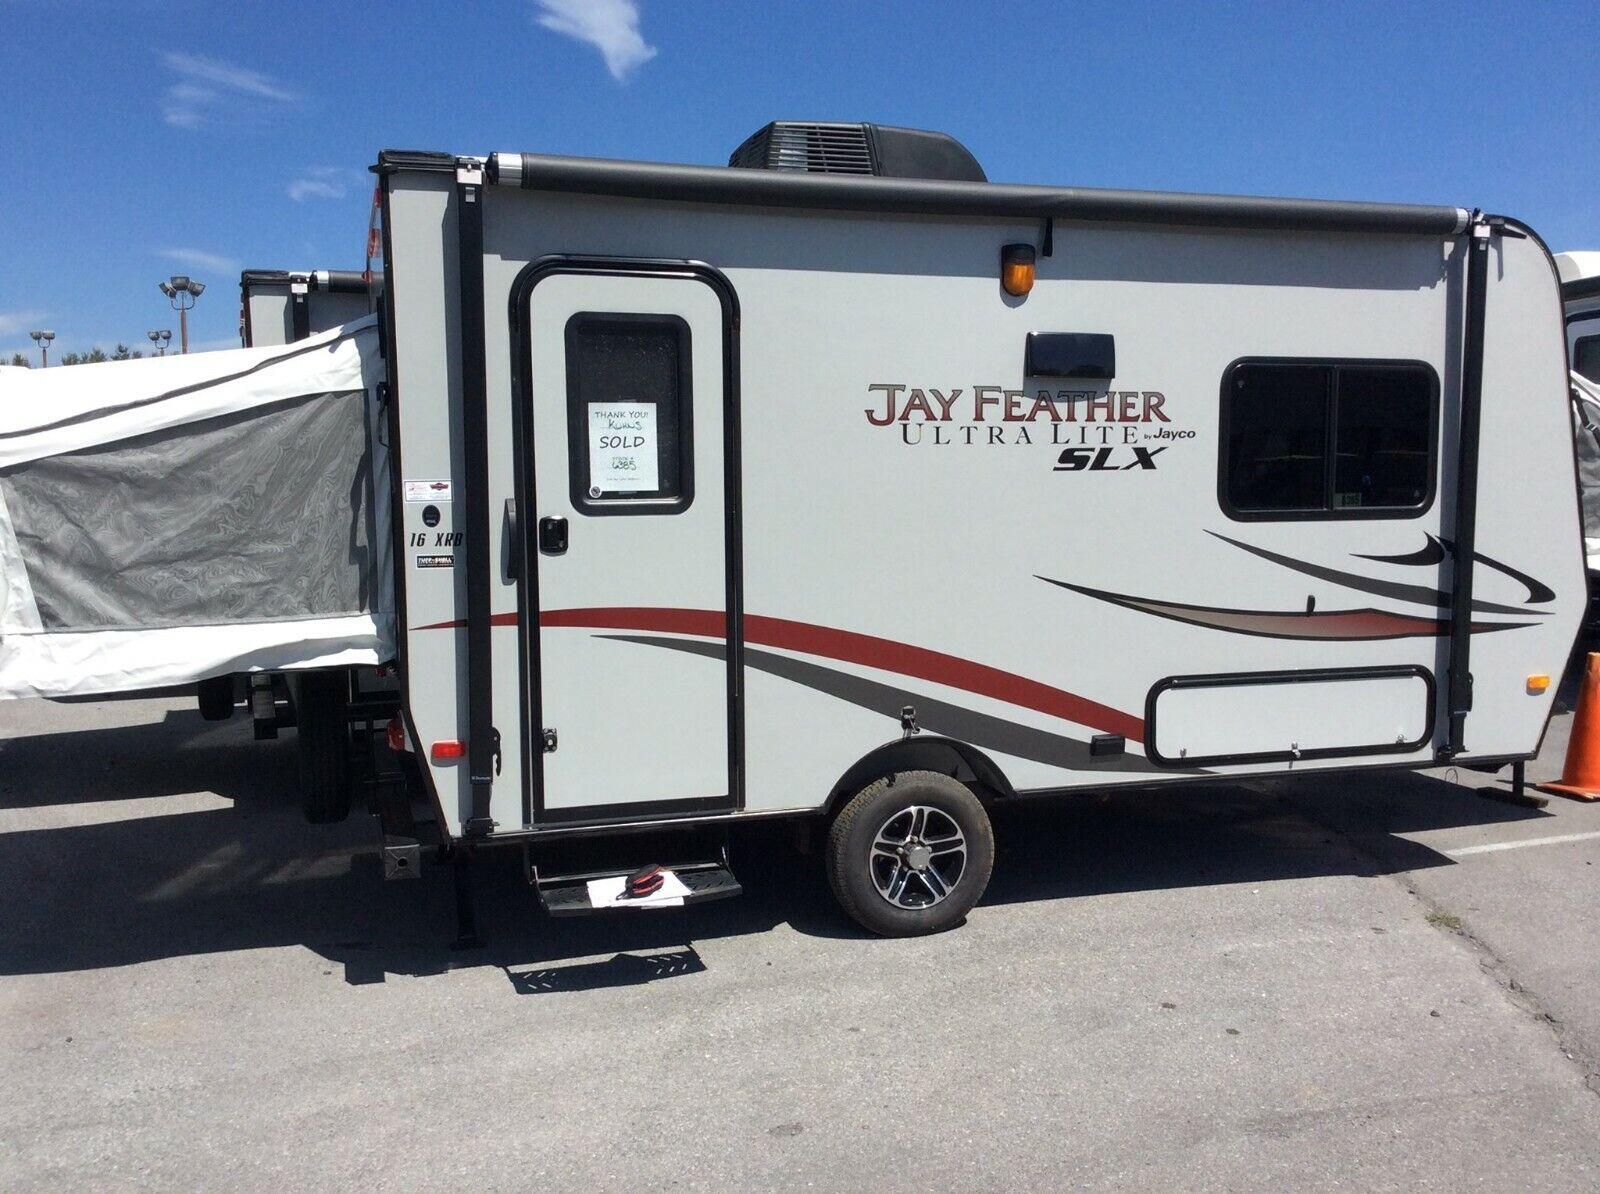 2014 Jayco, Jay Feather Ultra Lite Slx Series M-16 Xrv